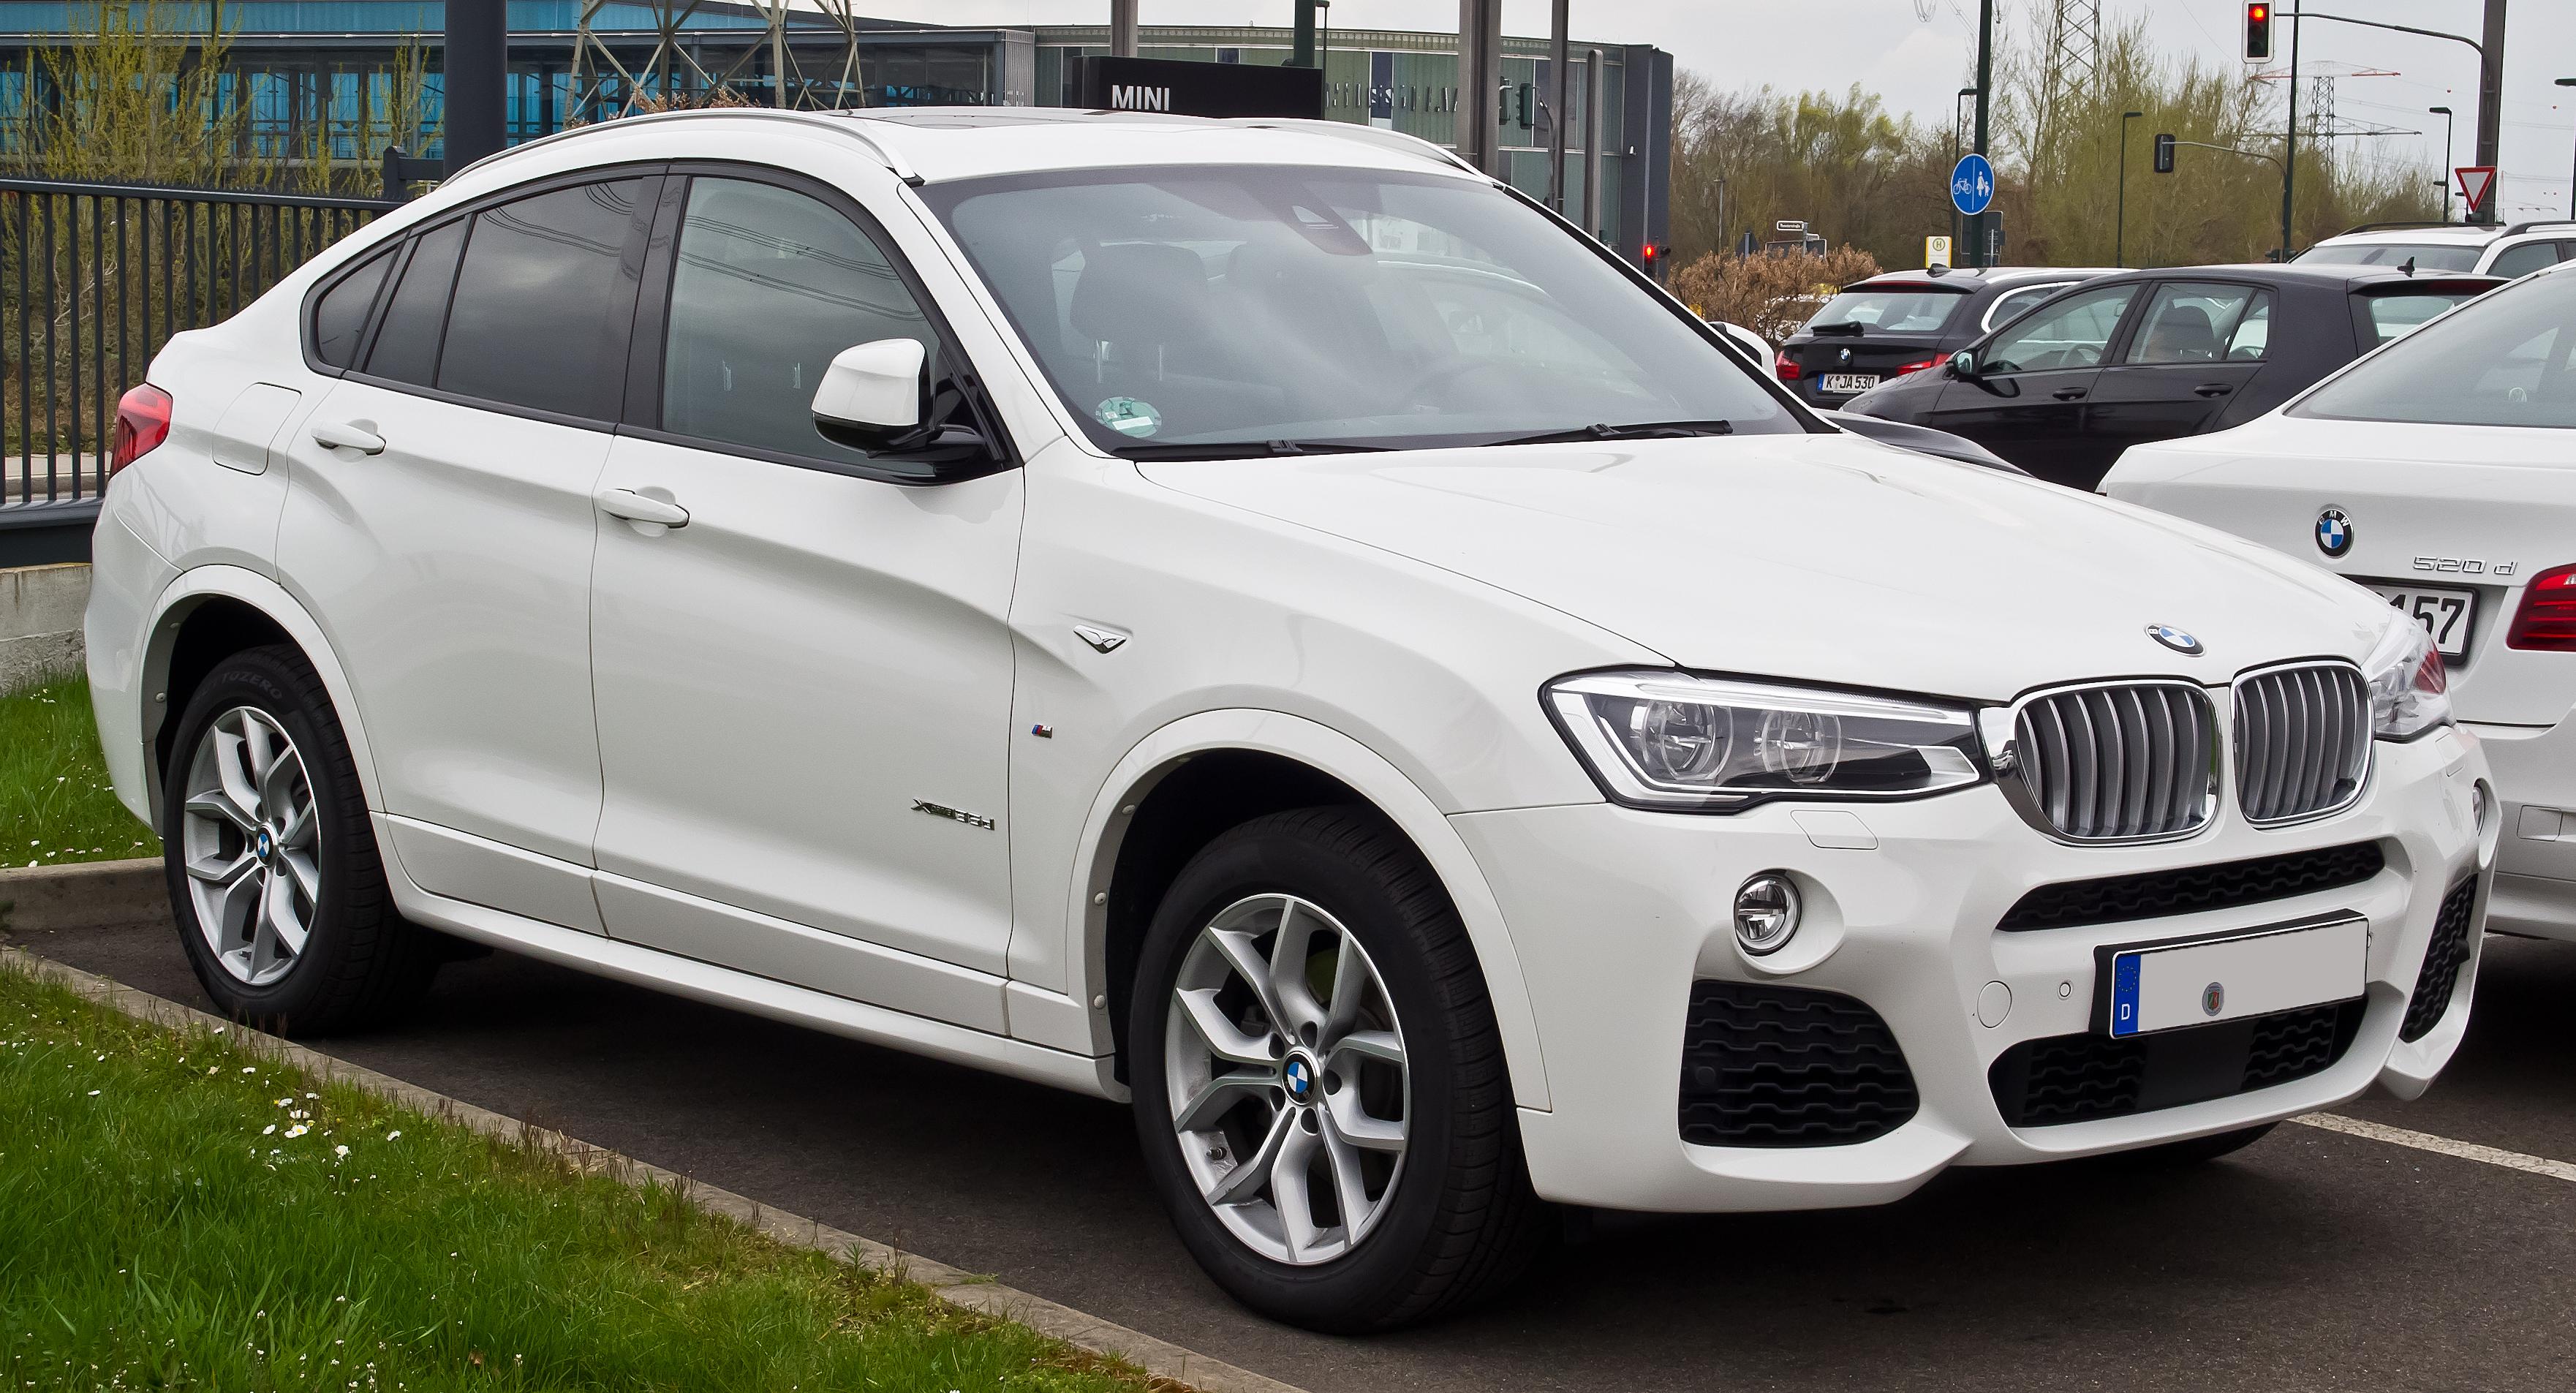 Bmw X4 Wiki >> File:BMW X4 xDrive35d M-Sportpaket (F26) – Frontansicht, 11. April 2015, Düsseldorf.jpg ...